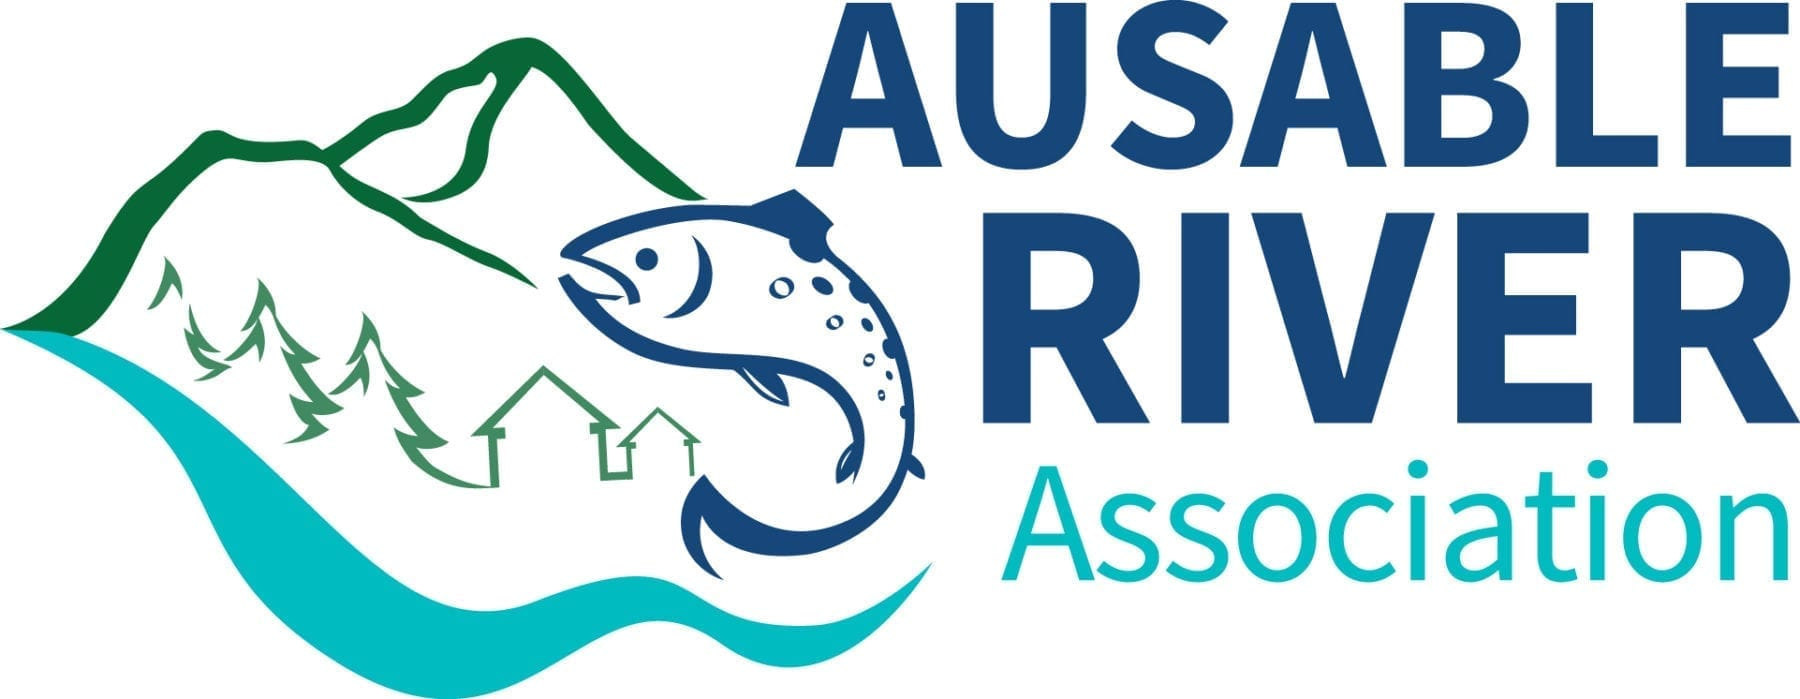 Ausable River Association Logo